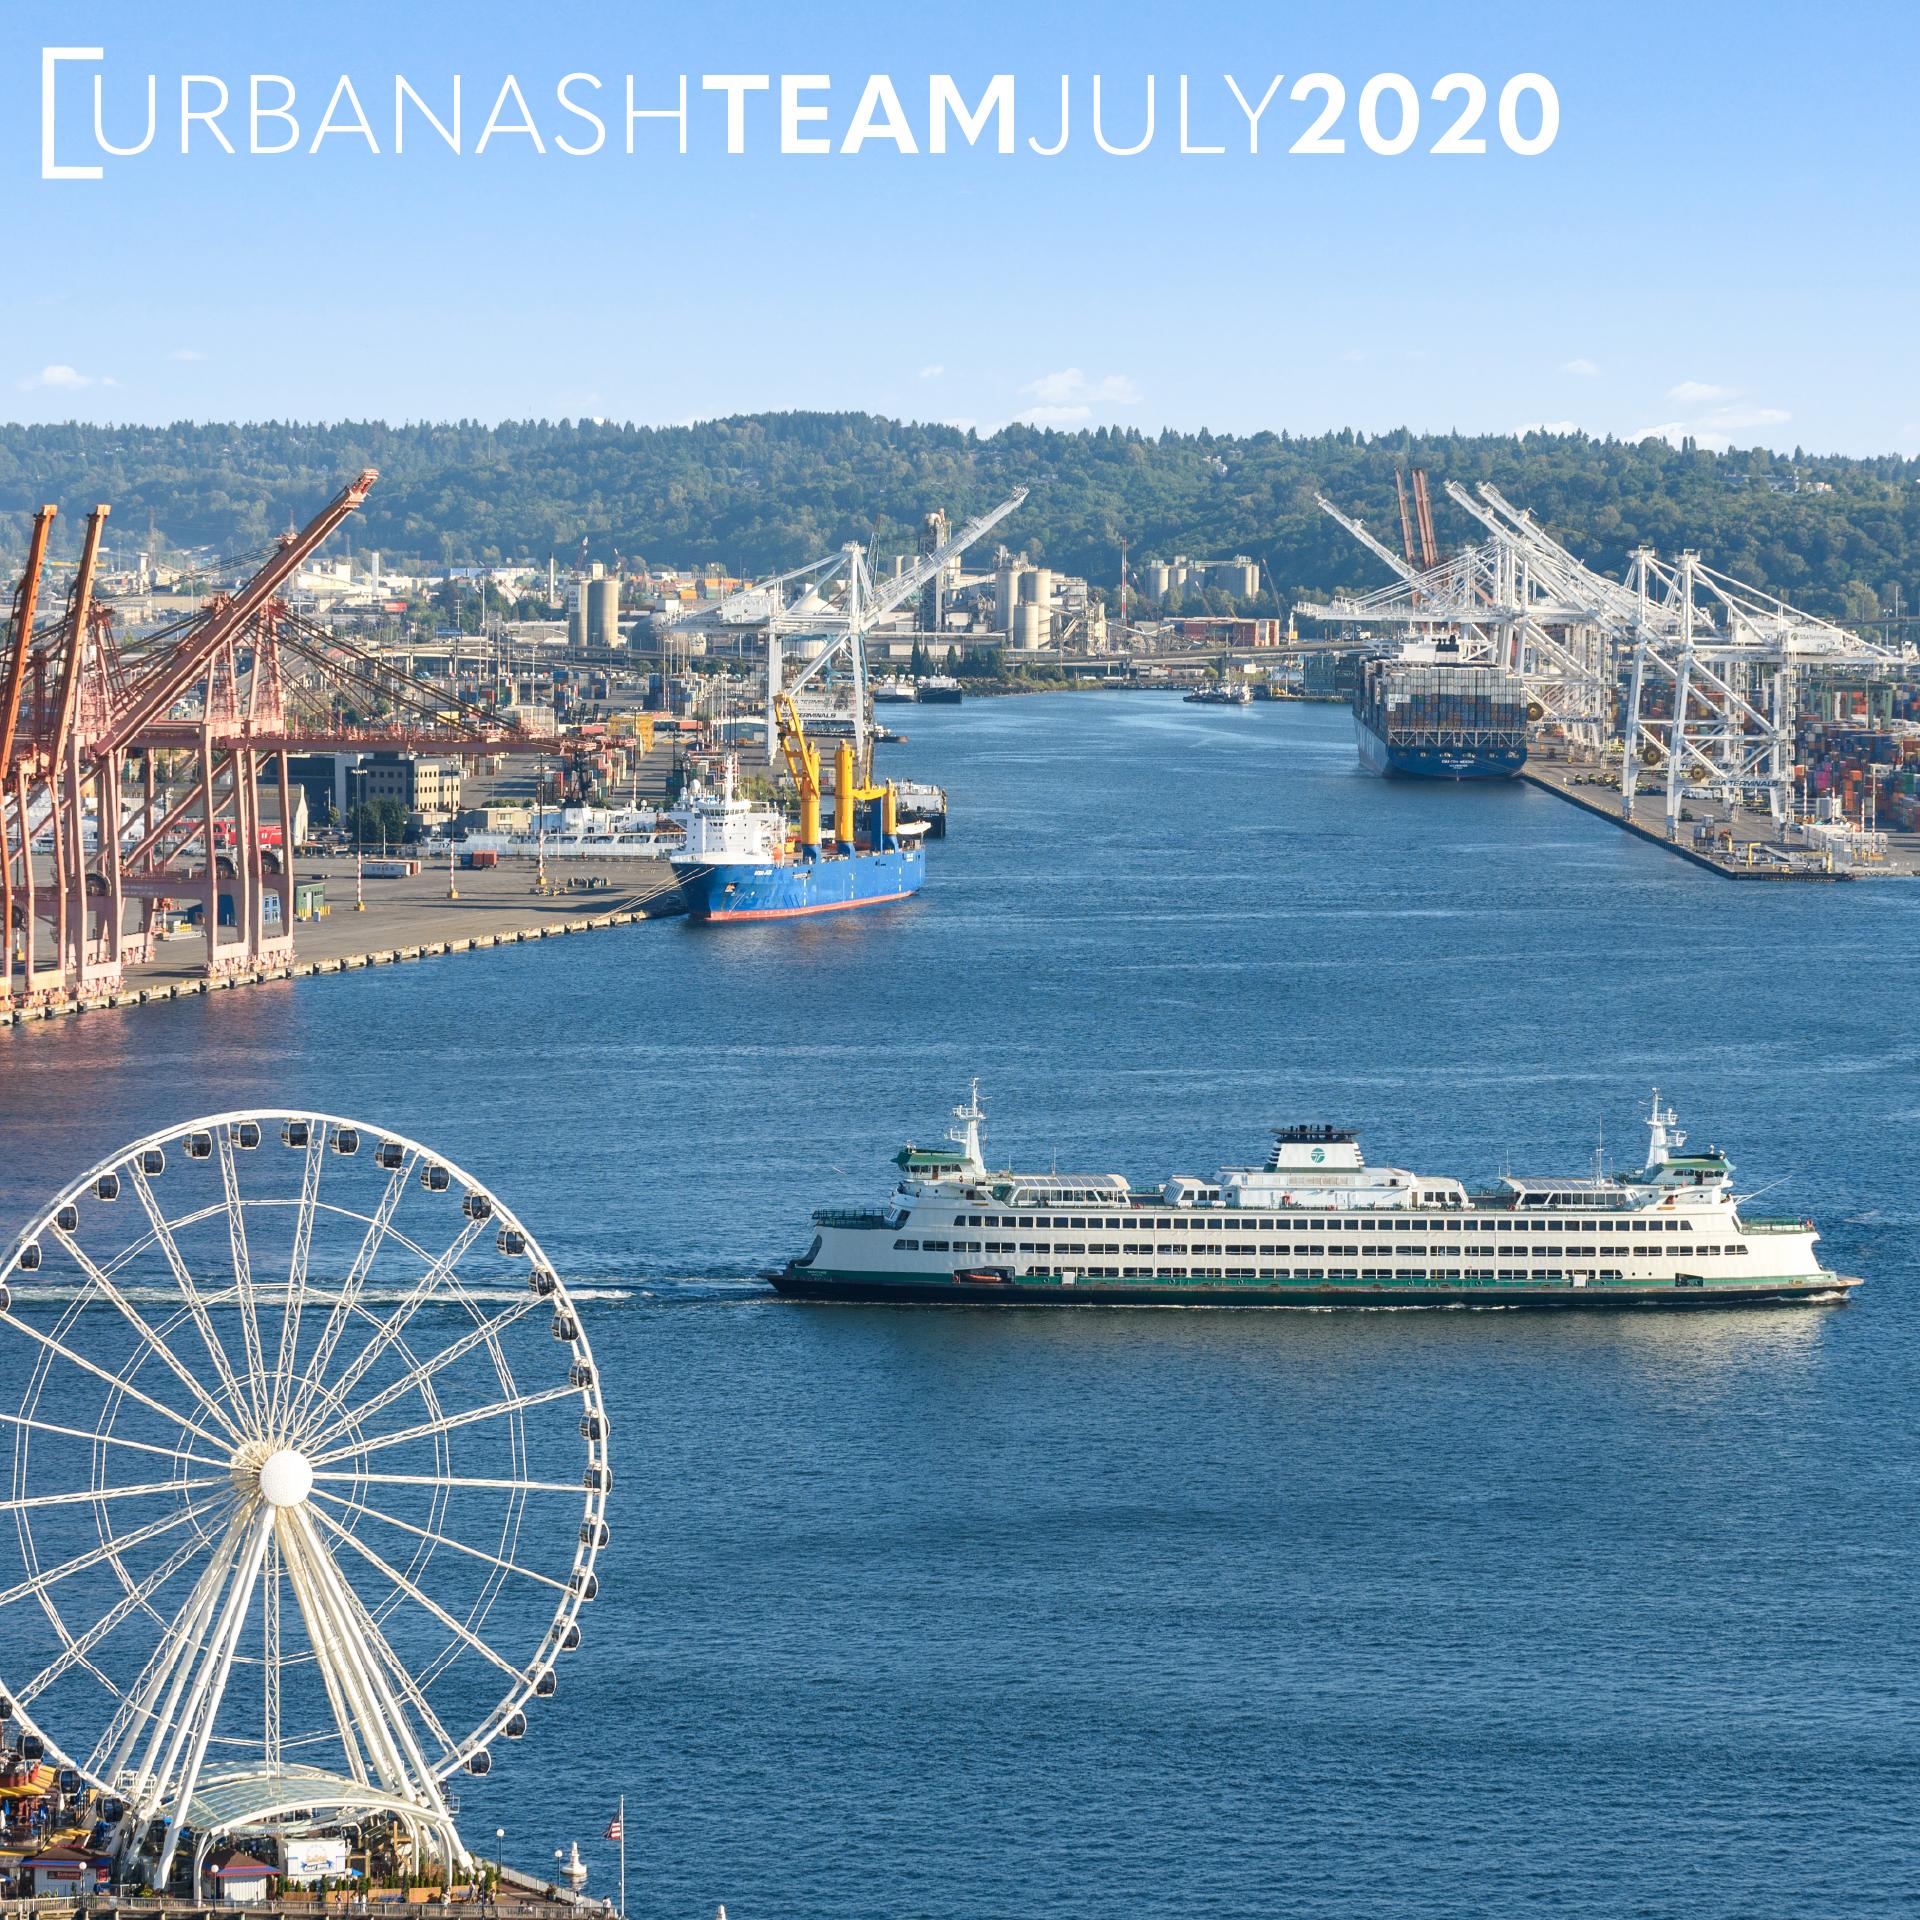 UrbanAsh Team July 2020 Listing Activity